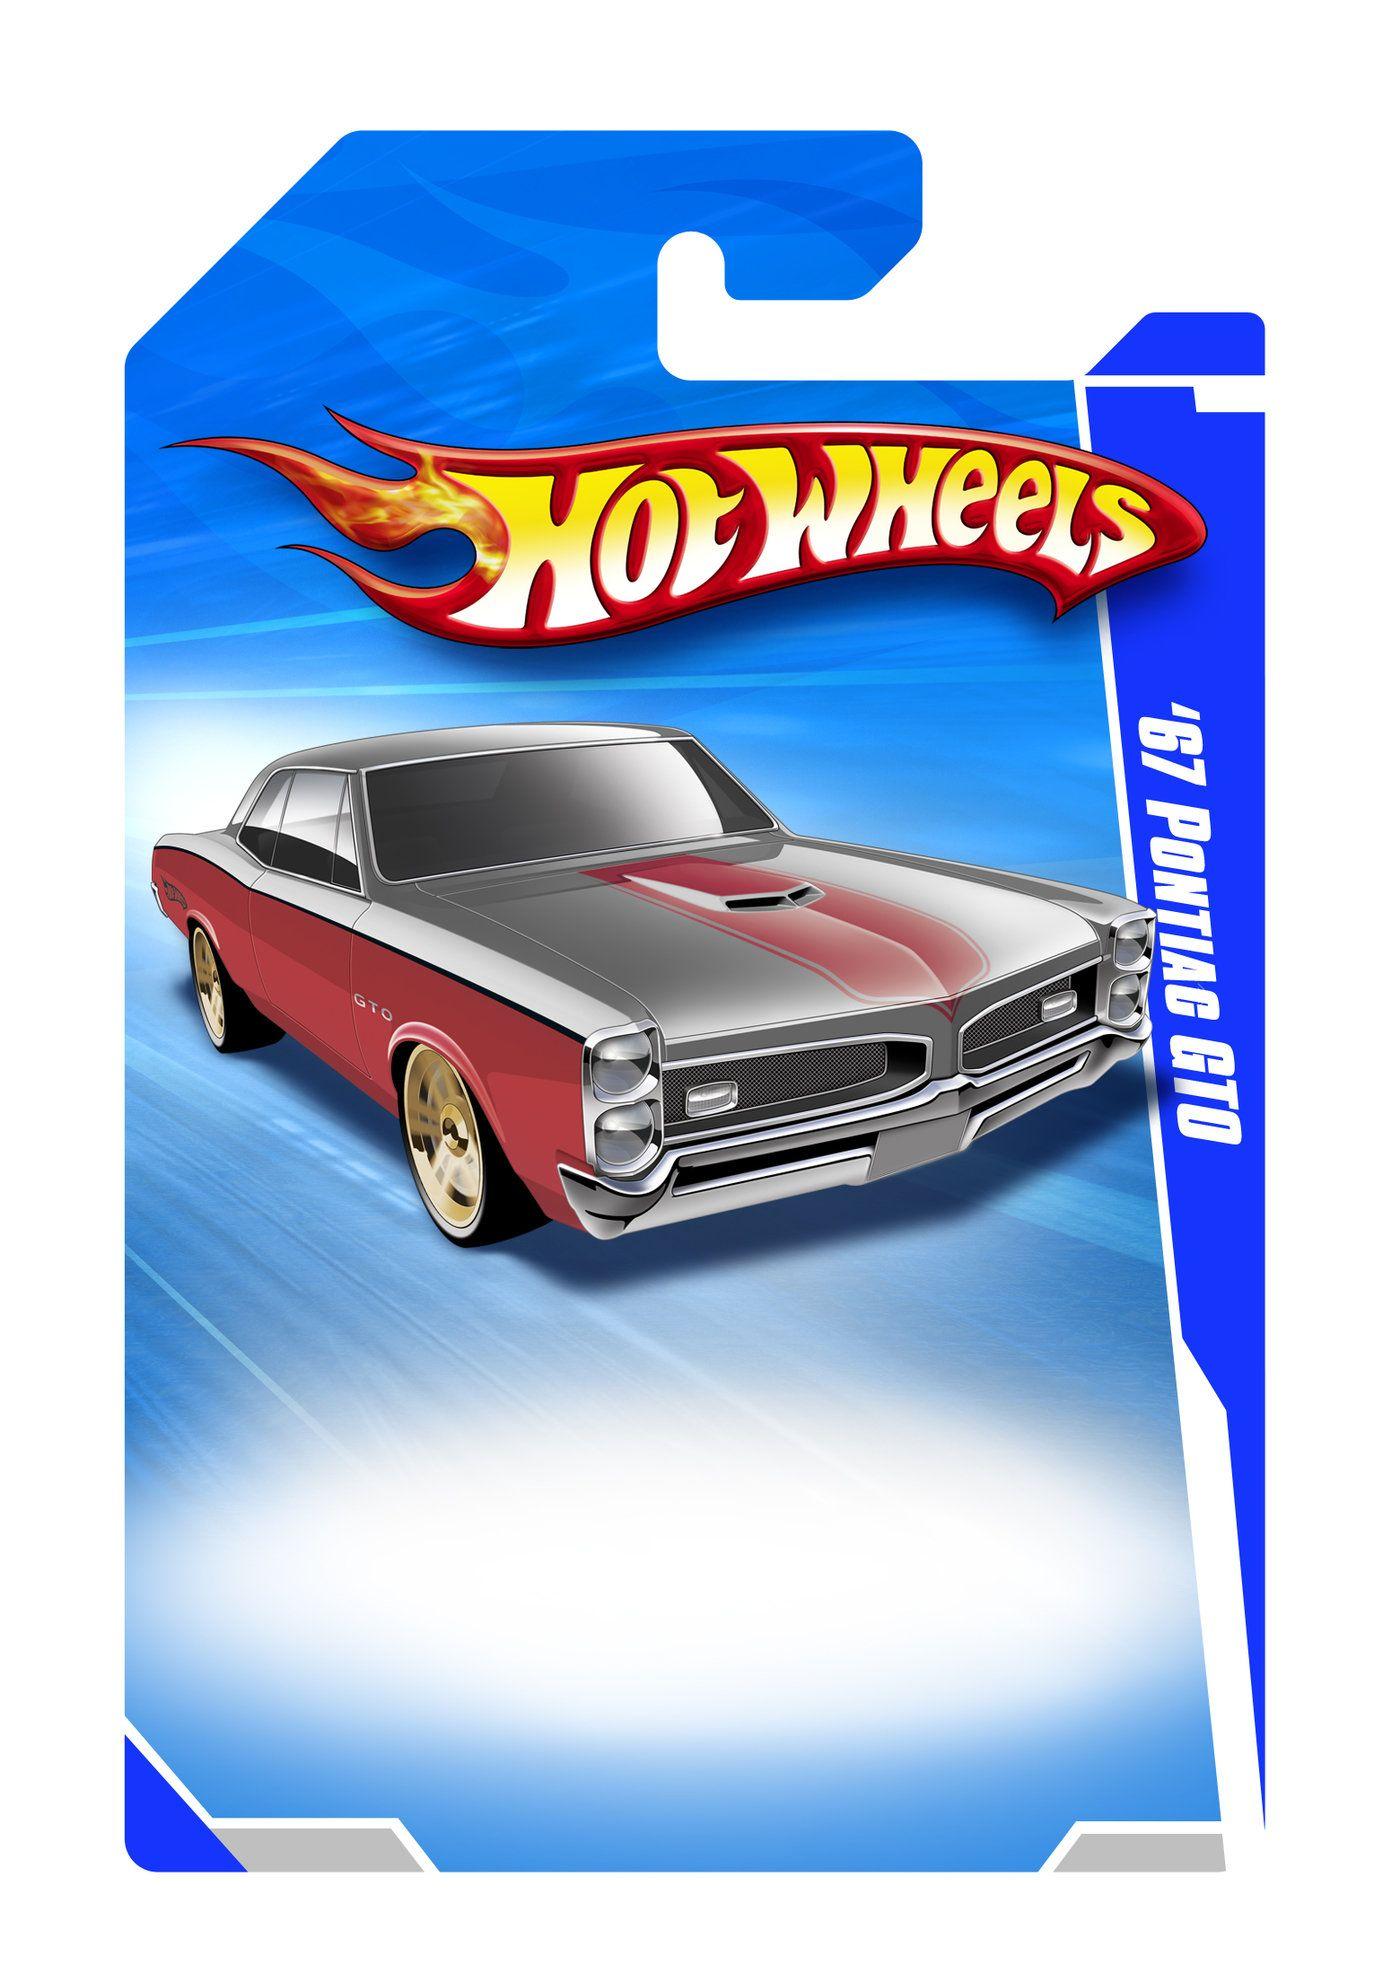 Hot Wheels Template Pontiac Gto Hot Wheels Pontiac Gto Toy Car